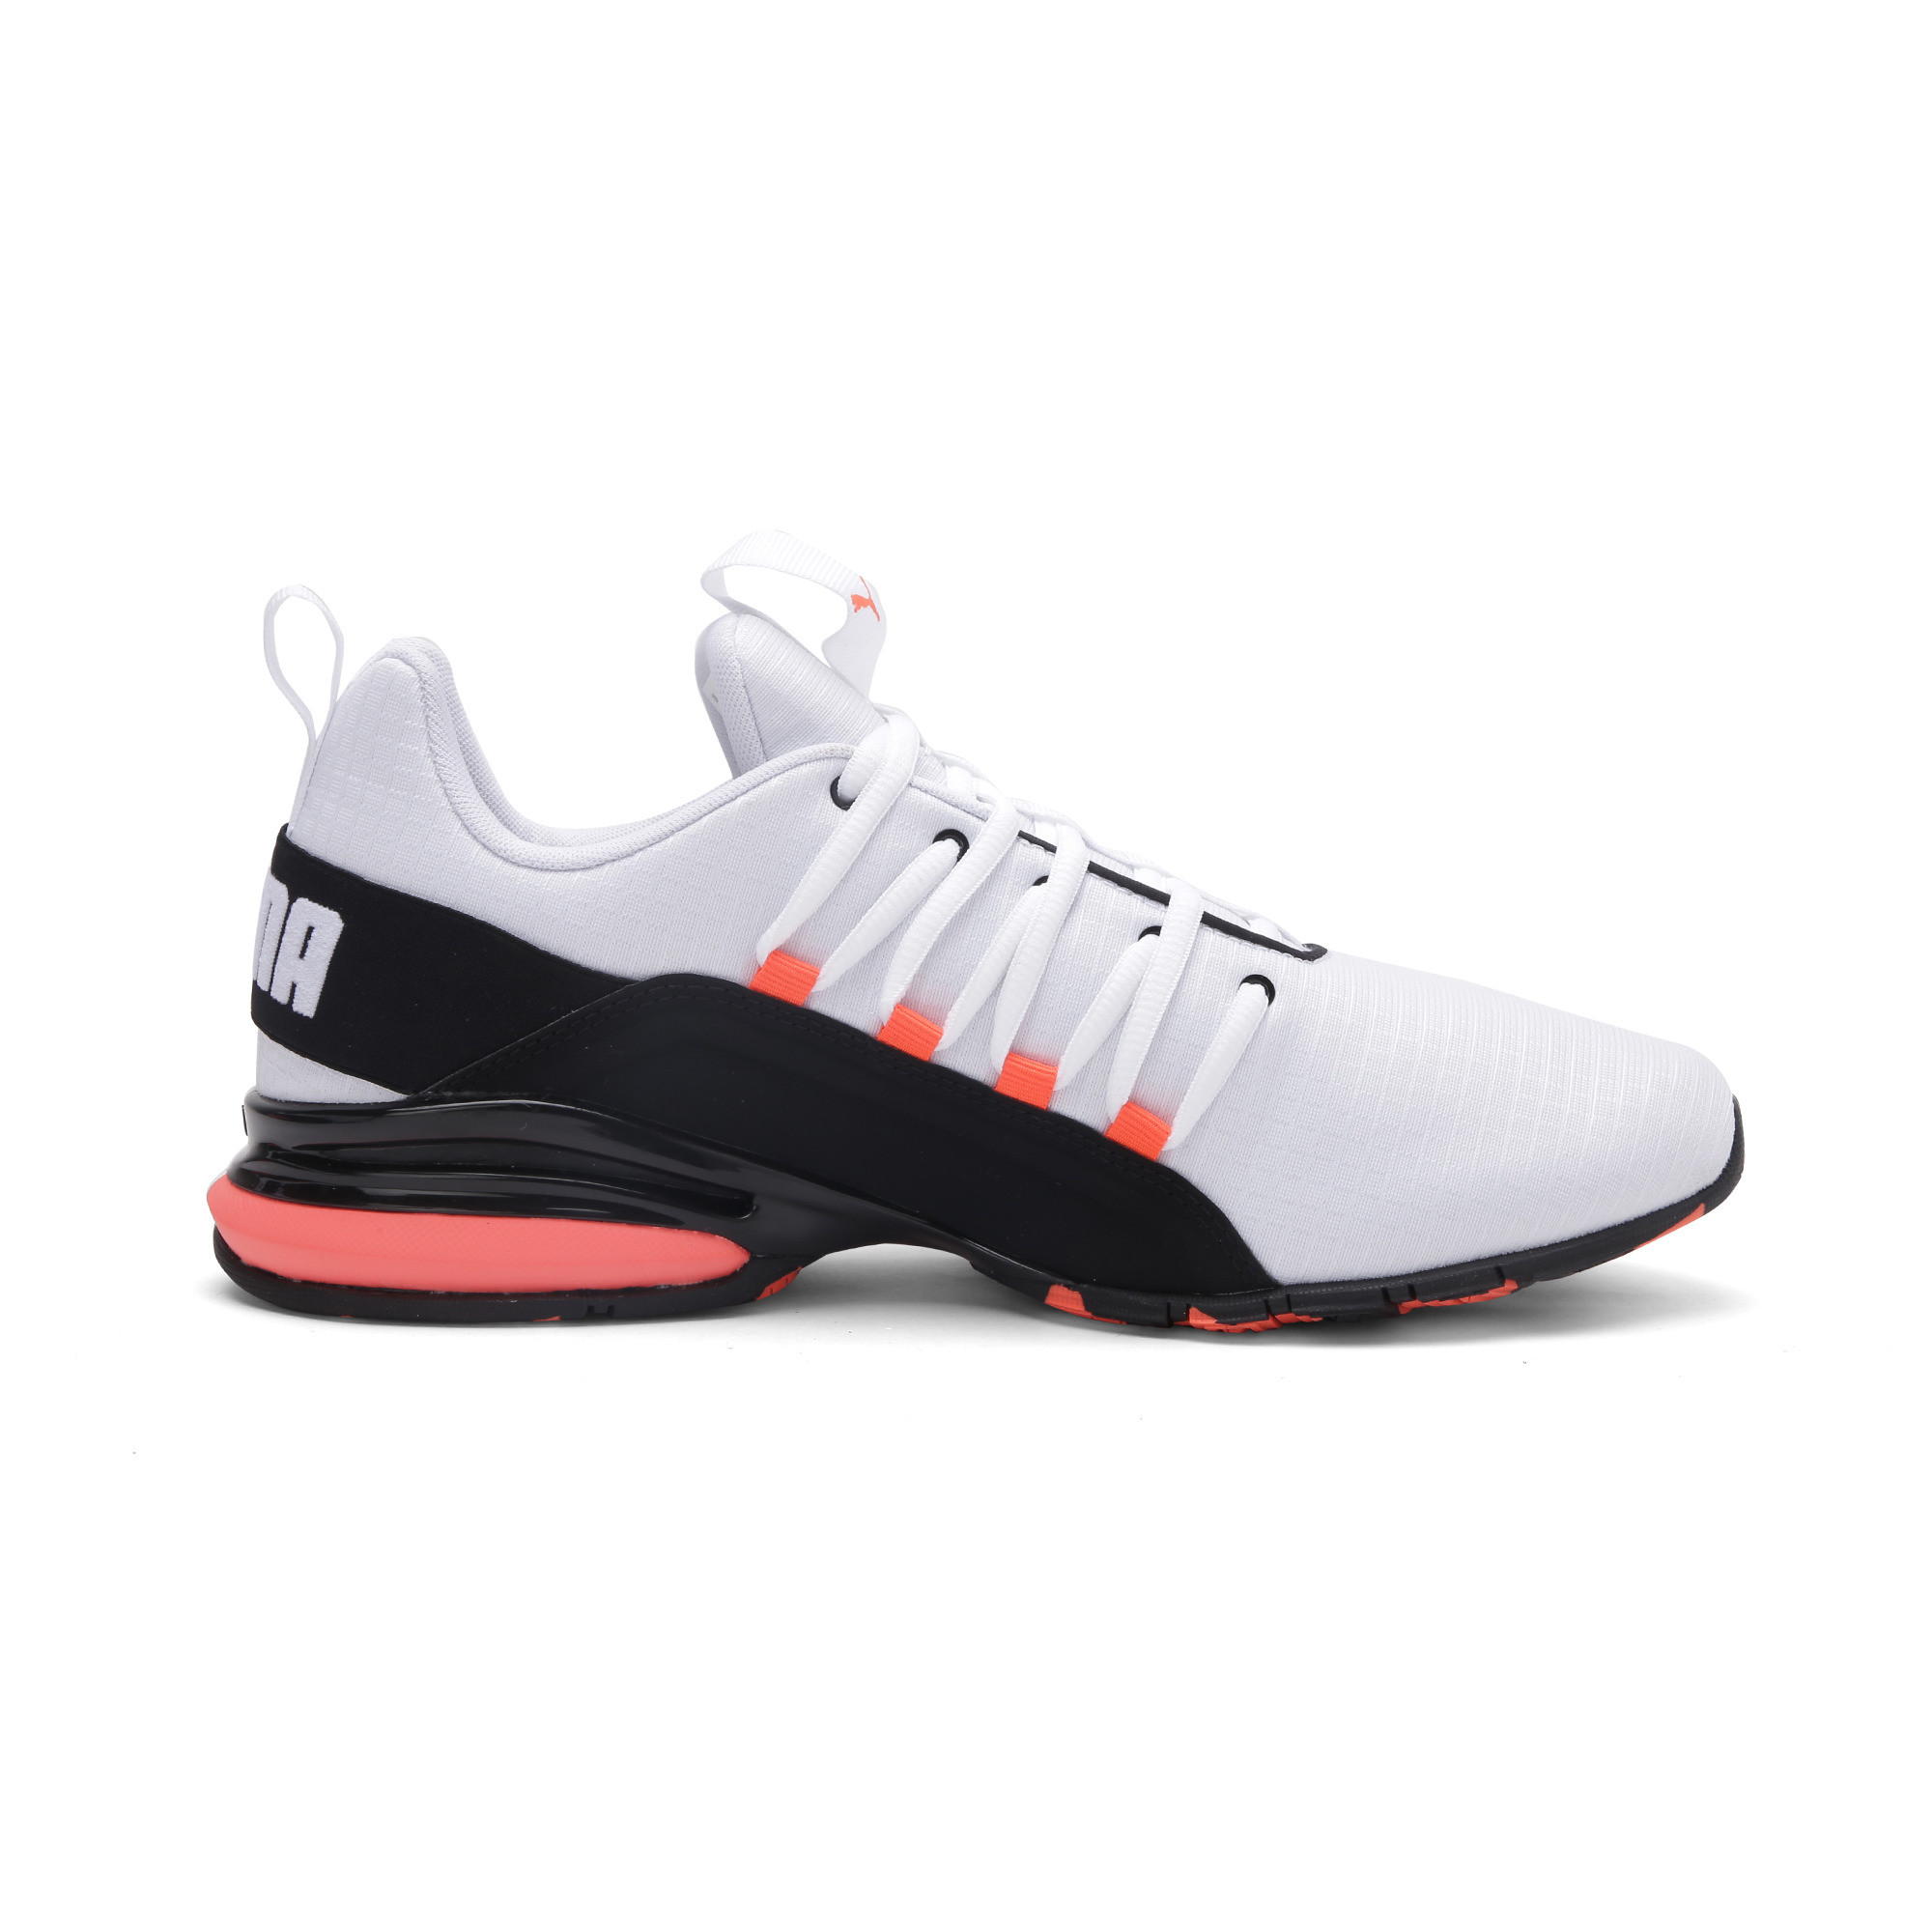 PUMA-Men-039-s-Axelion-Rip-Training-Shoes thumbnail 7